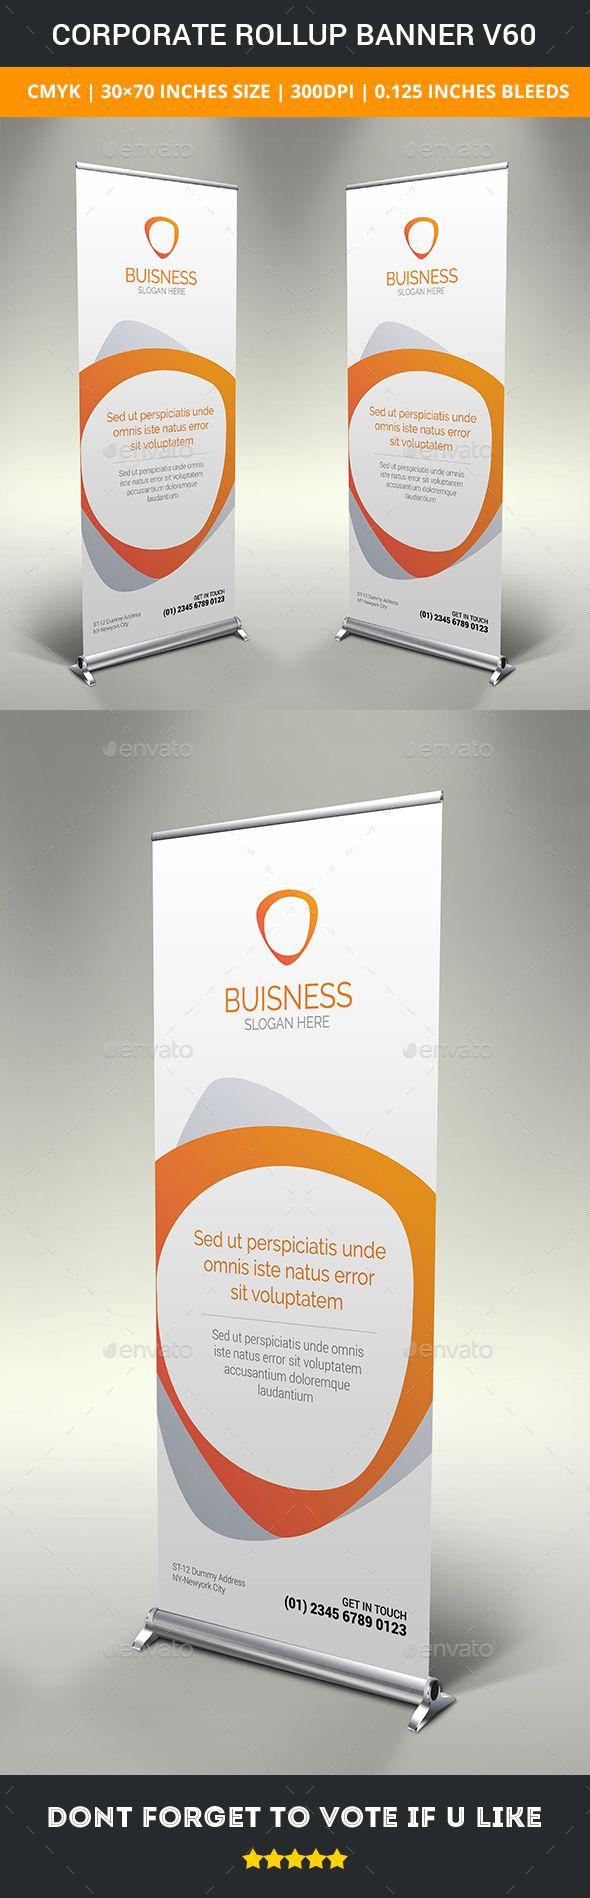 Nice Illustrator Banner Template Gallery - Professional Resume ...